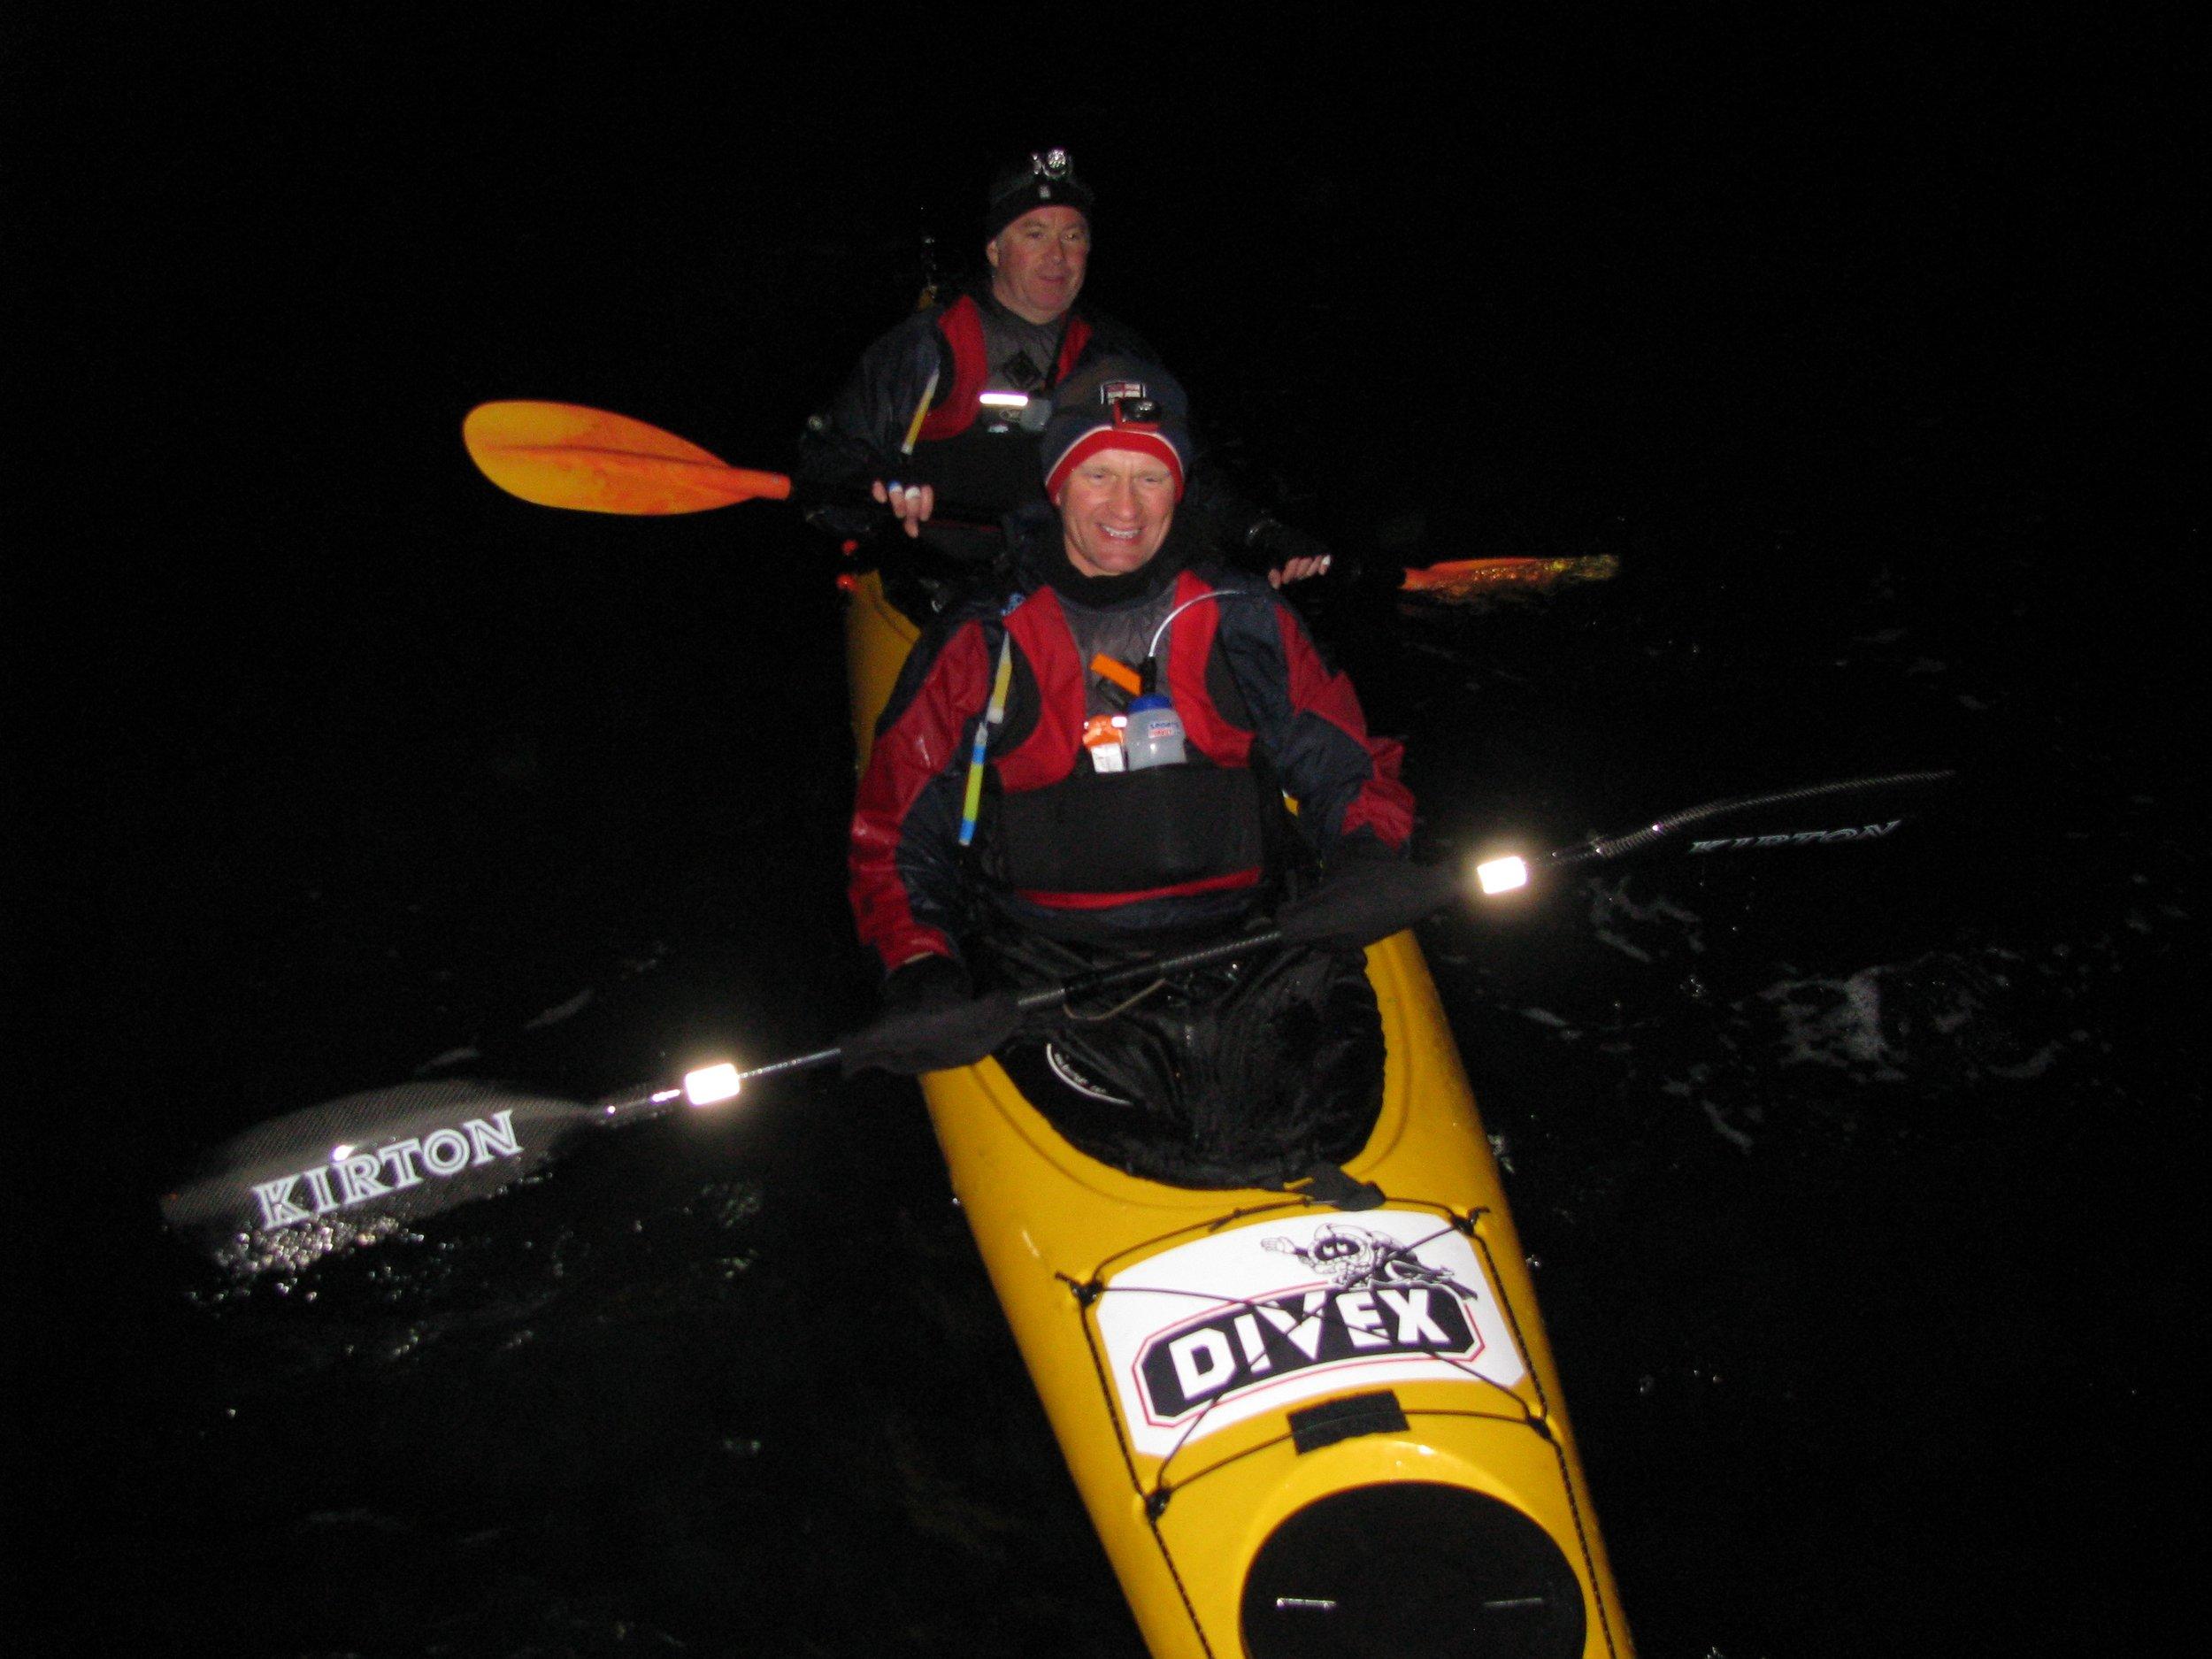 Horsea Canoe Challenge 18 Apr 2013 015.jpg